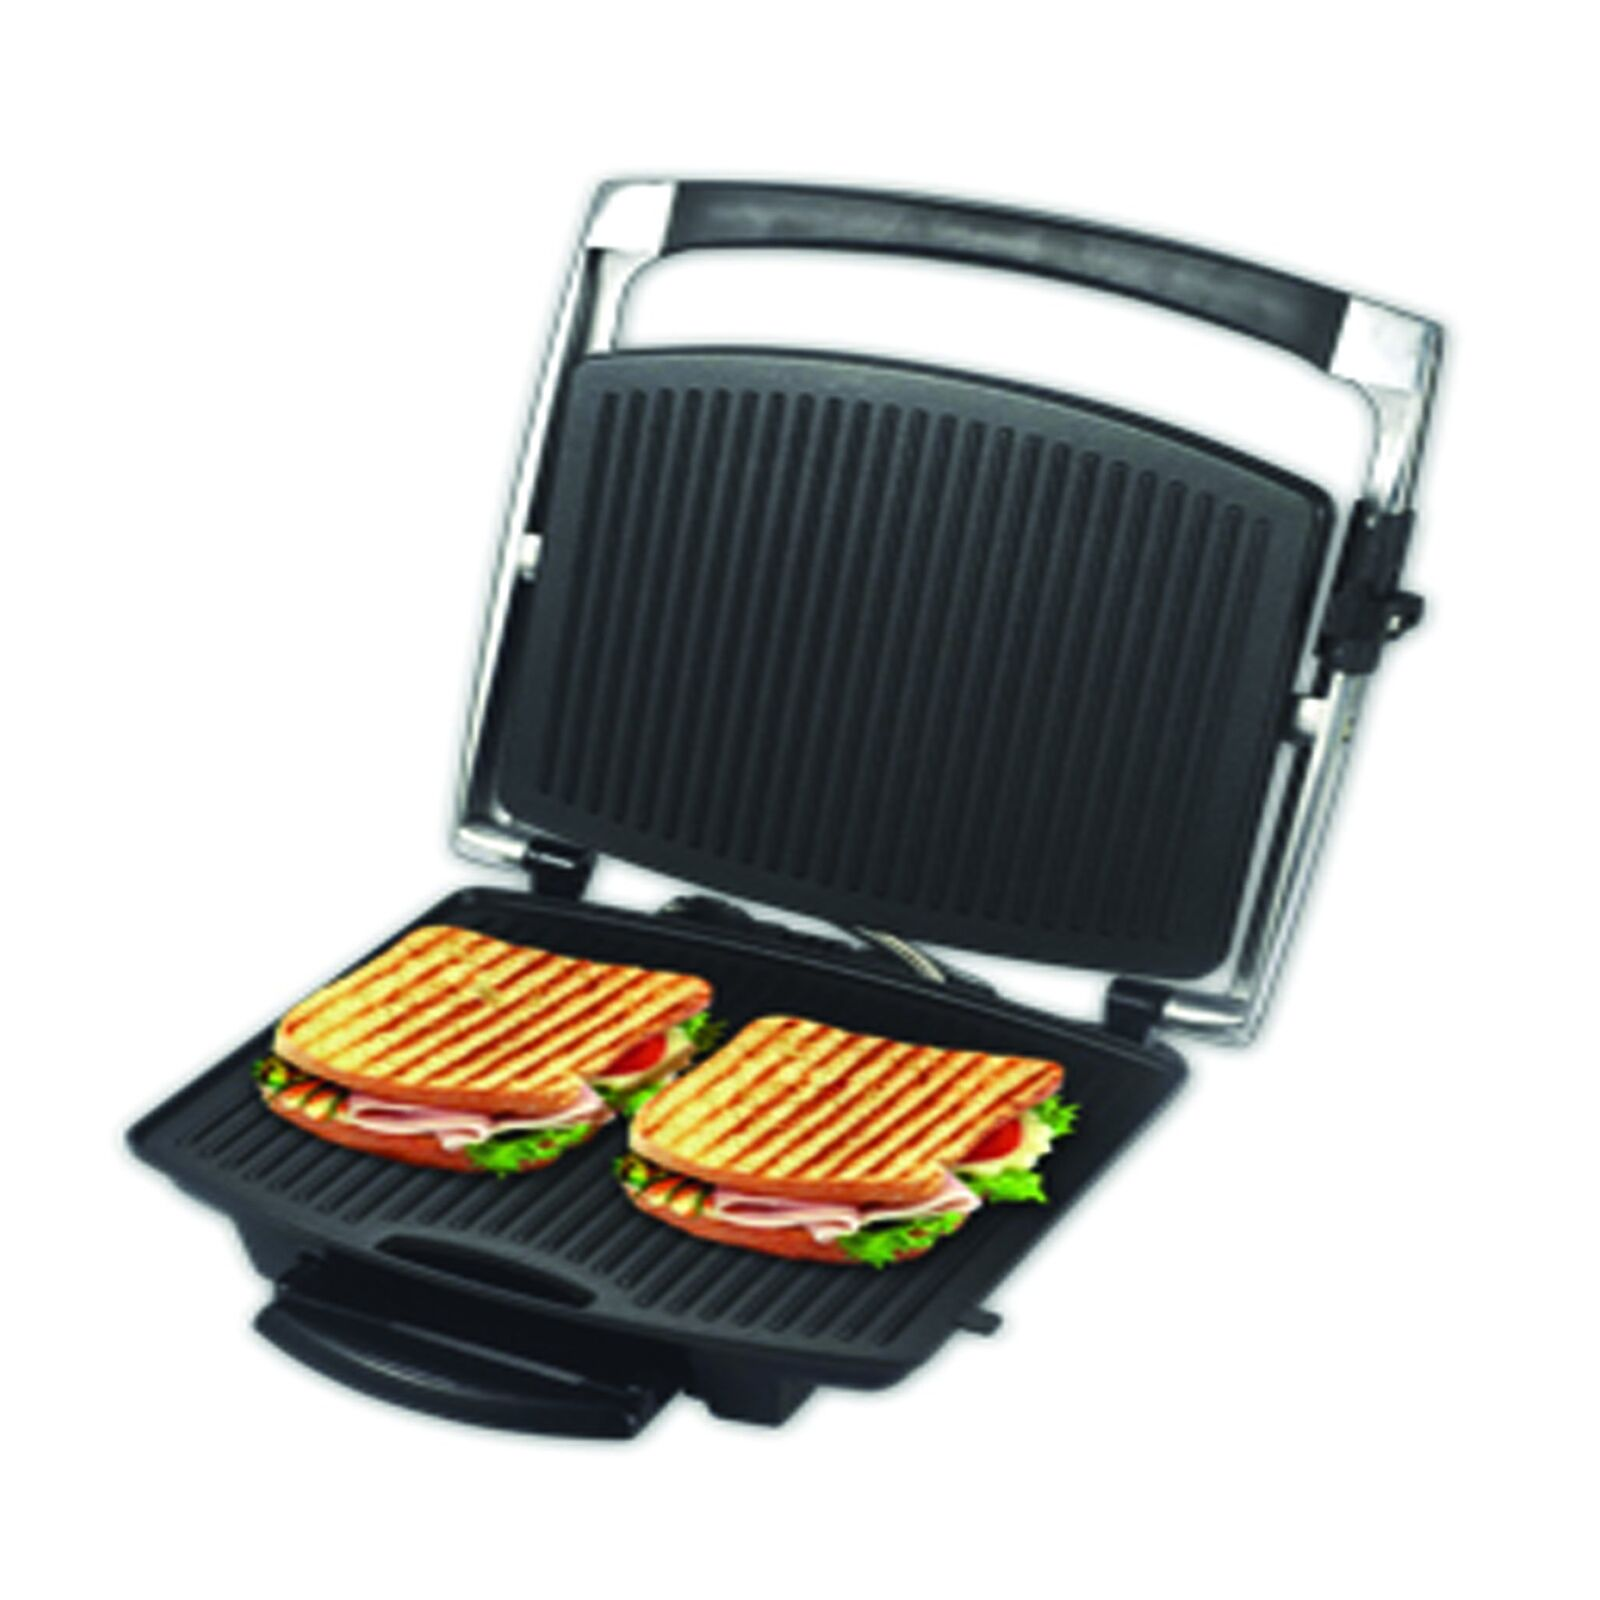 Alpina SF-6021 Panini Presse antiadhésif Gourmet 4 Sandwich Maker 220-240 V 50